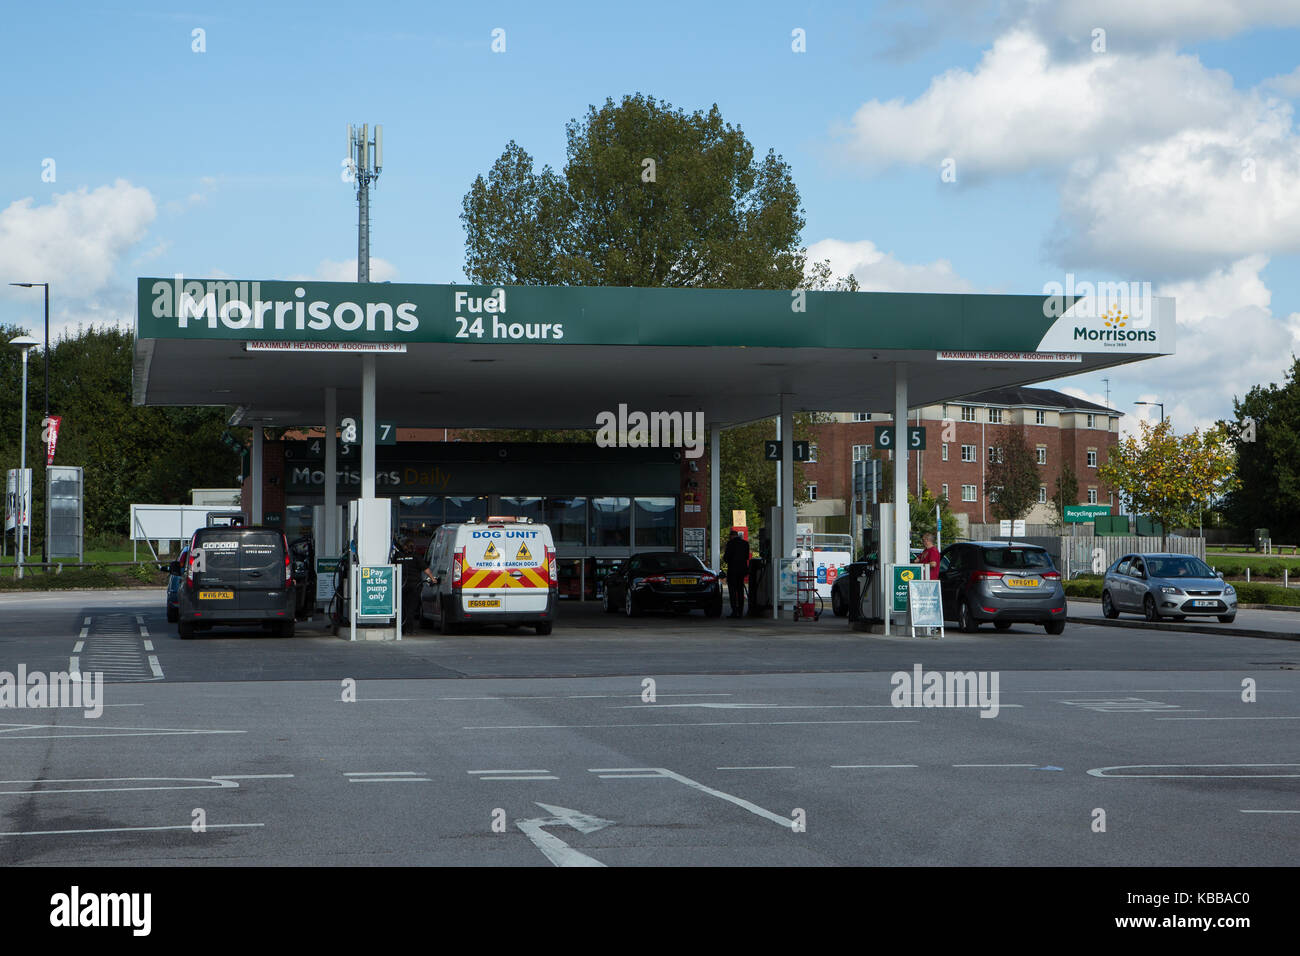 Morrisons Fuel Station Stock Photos & Morrisons Fuel Station Stock ...